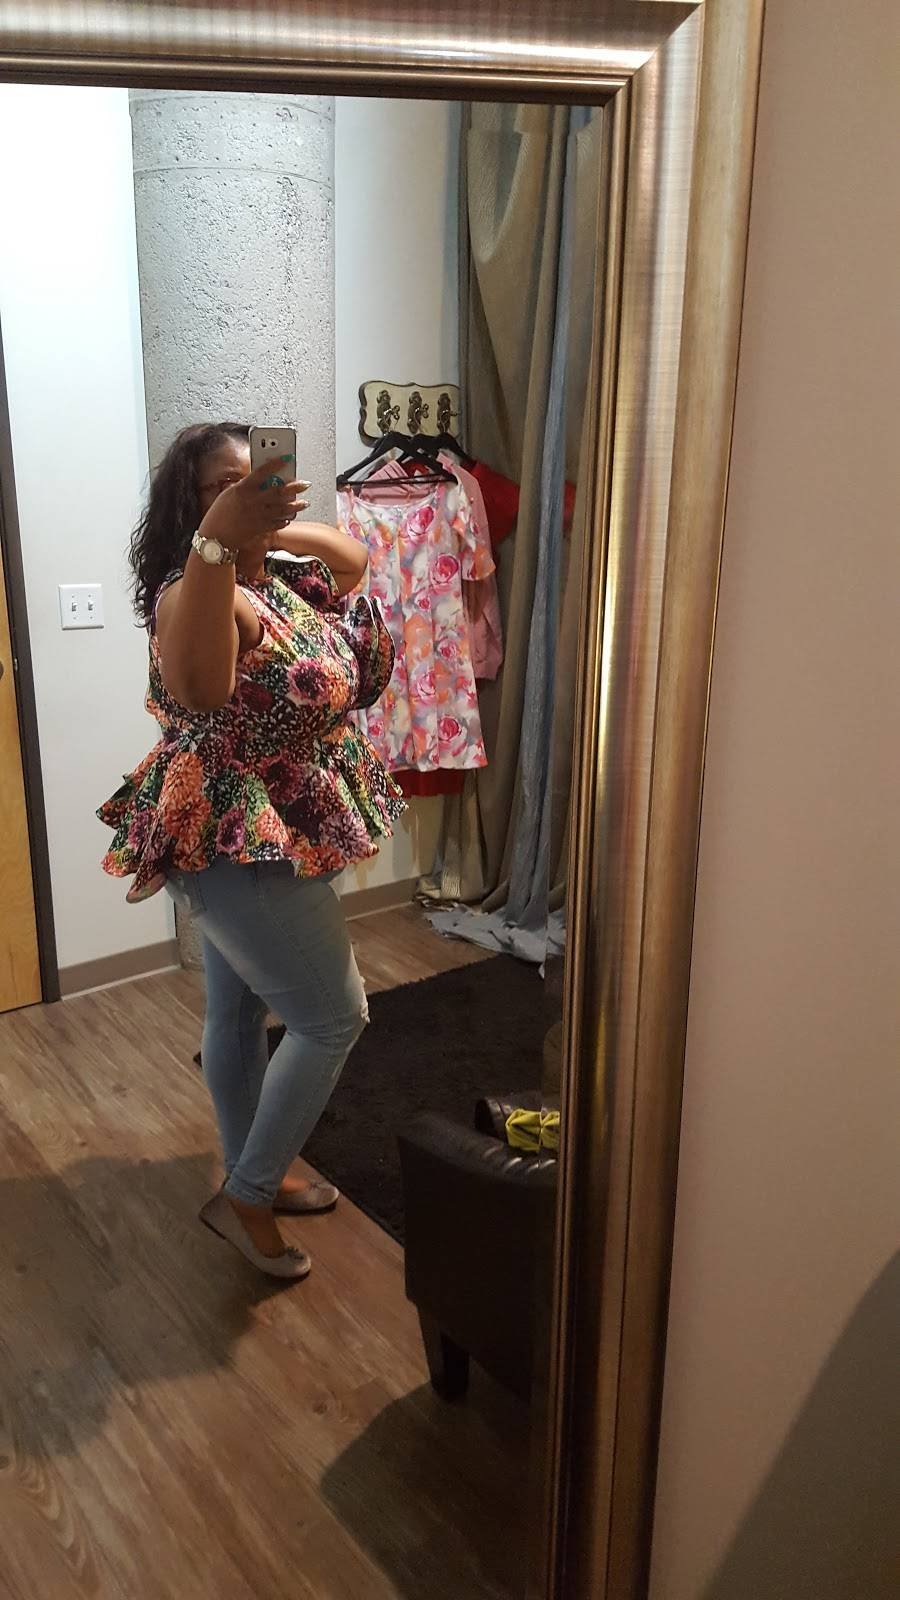 Epiphany Boutique - clothing store  | Photo 7 of 8 | Address: 3431 Locust St, St. Louis, MO 63103, USA | Phone: (314) 249-5384